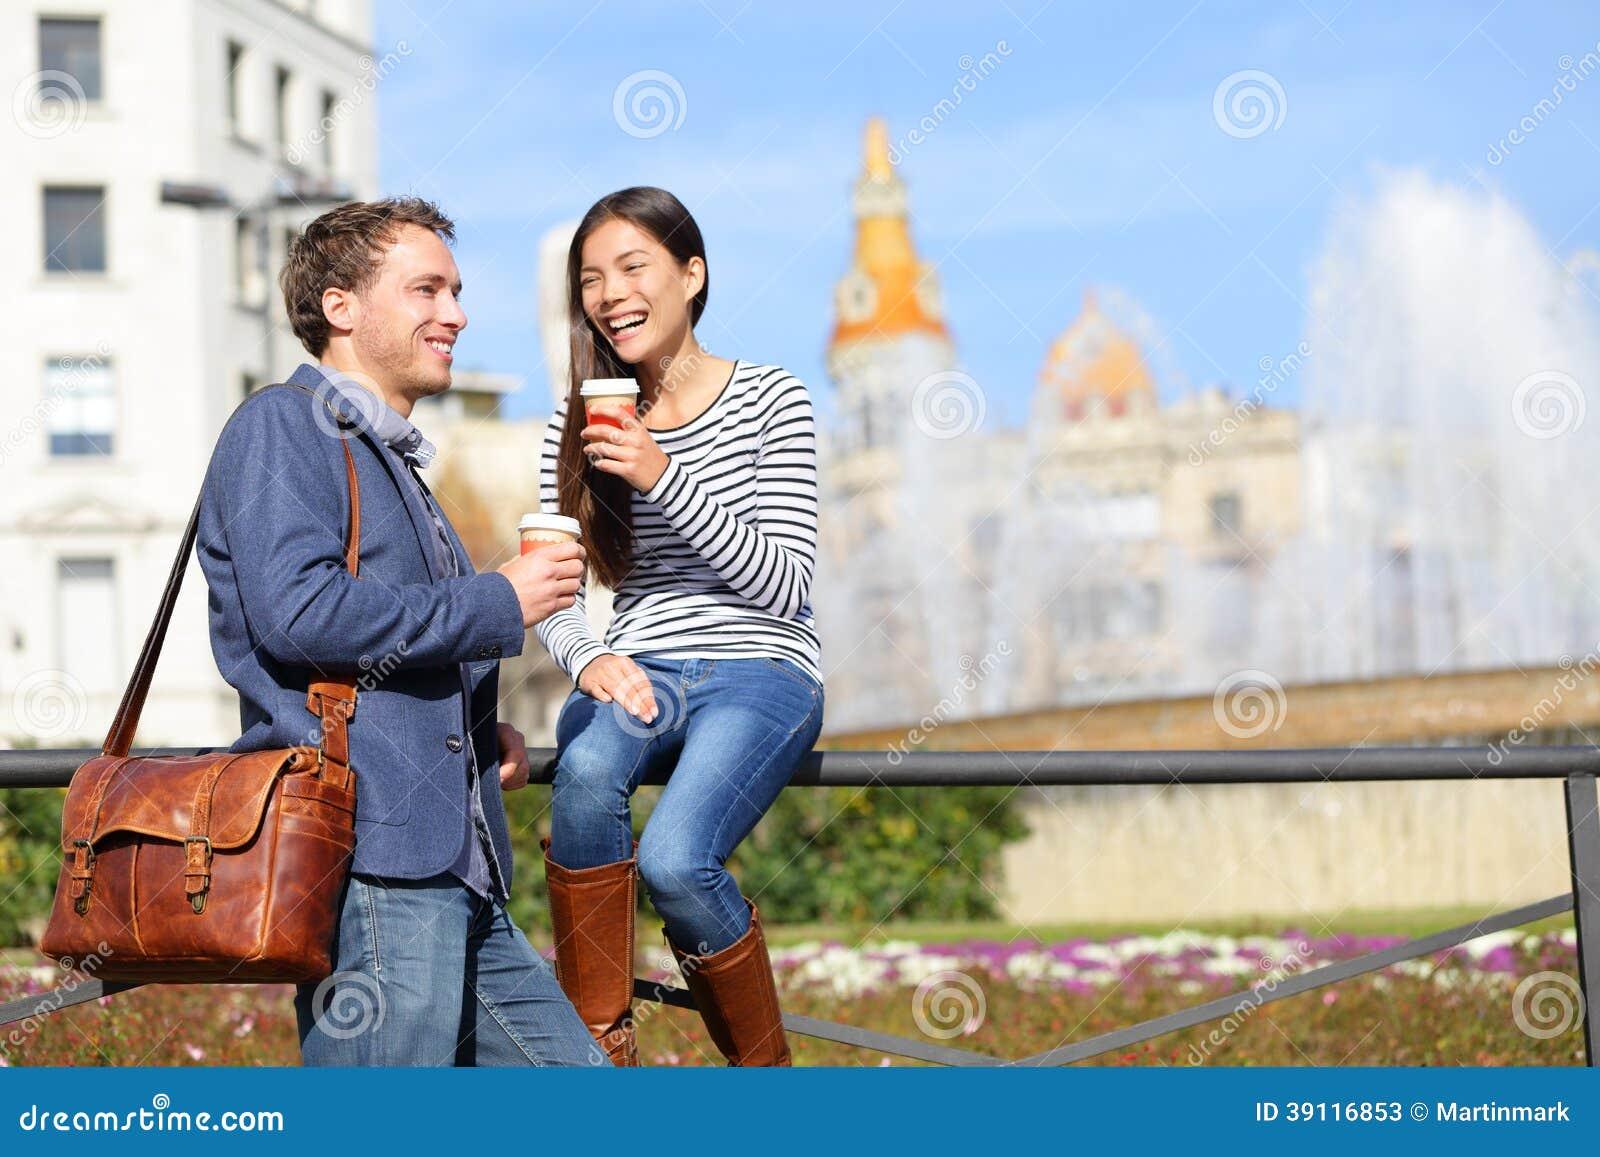 flirting moves that work for men images funny images for women